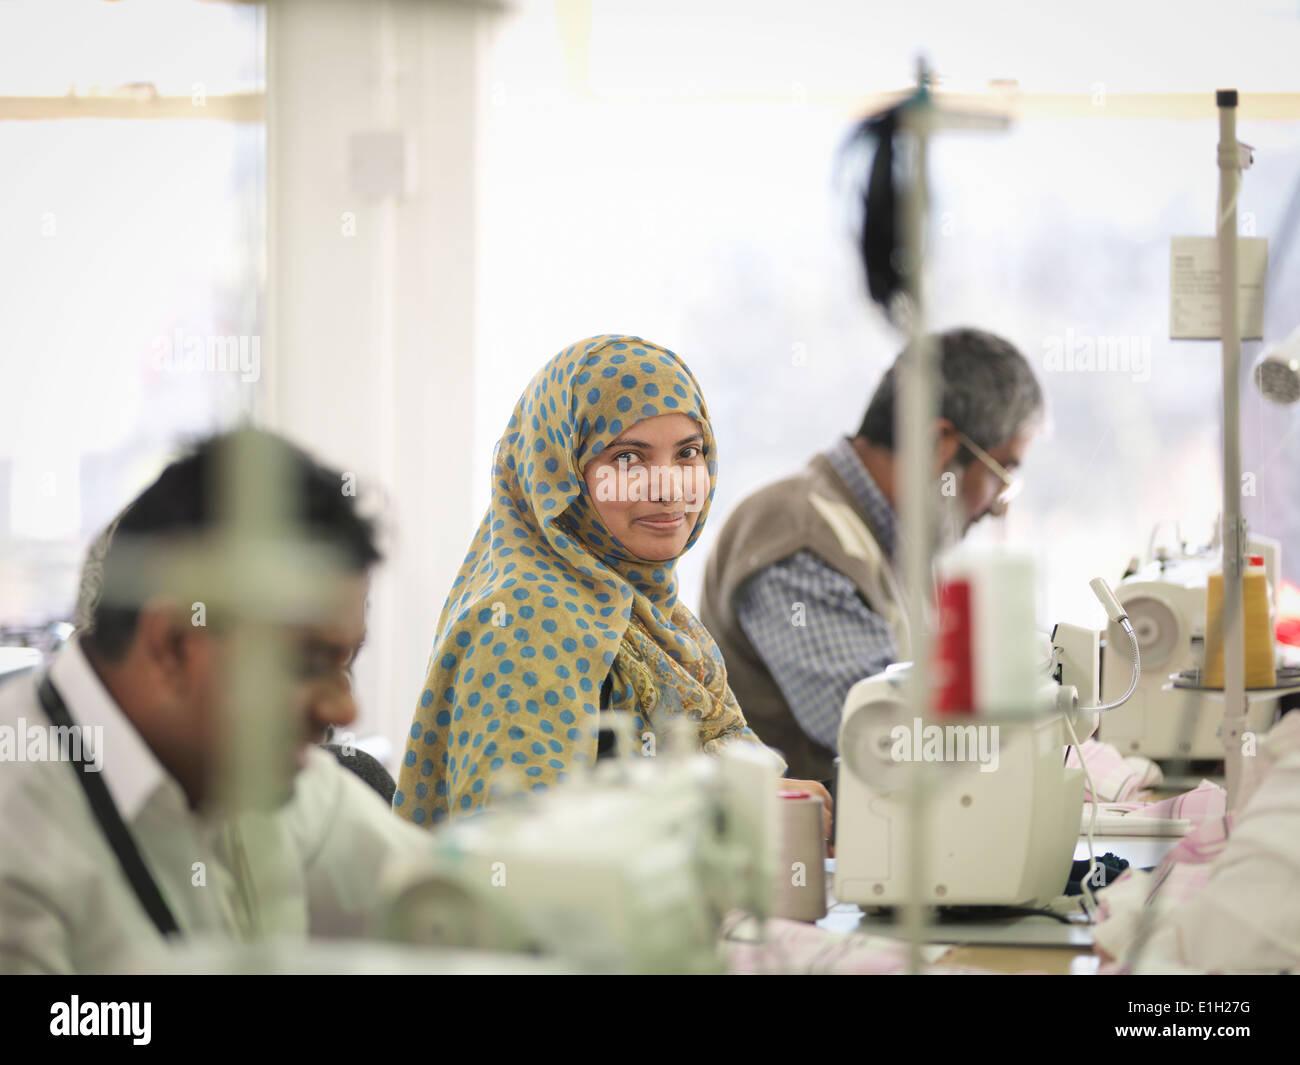 Arbeitnehmerin in Textilfabrik, Porträt Stockbild